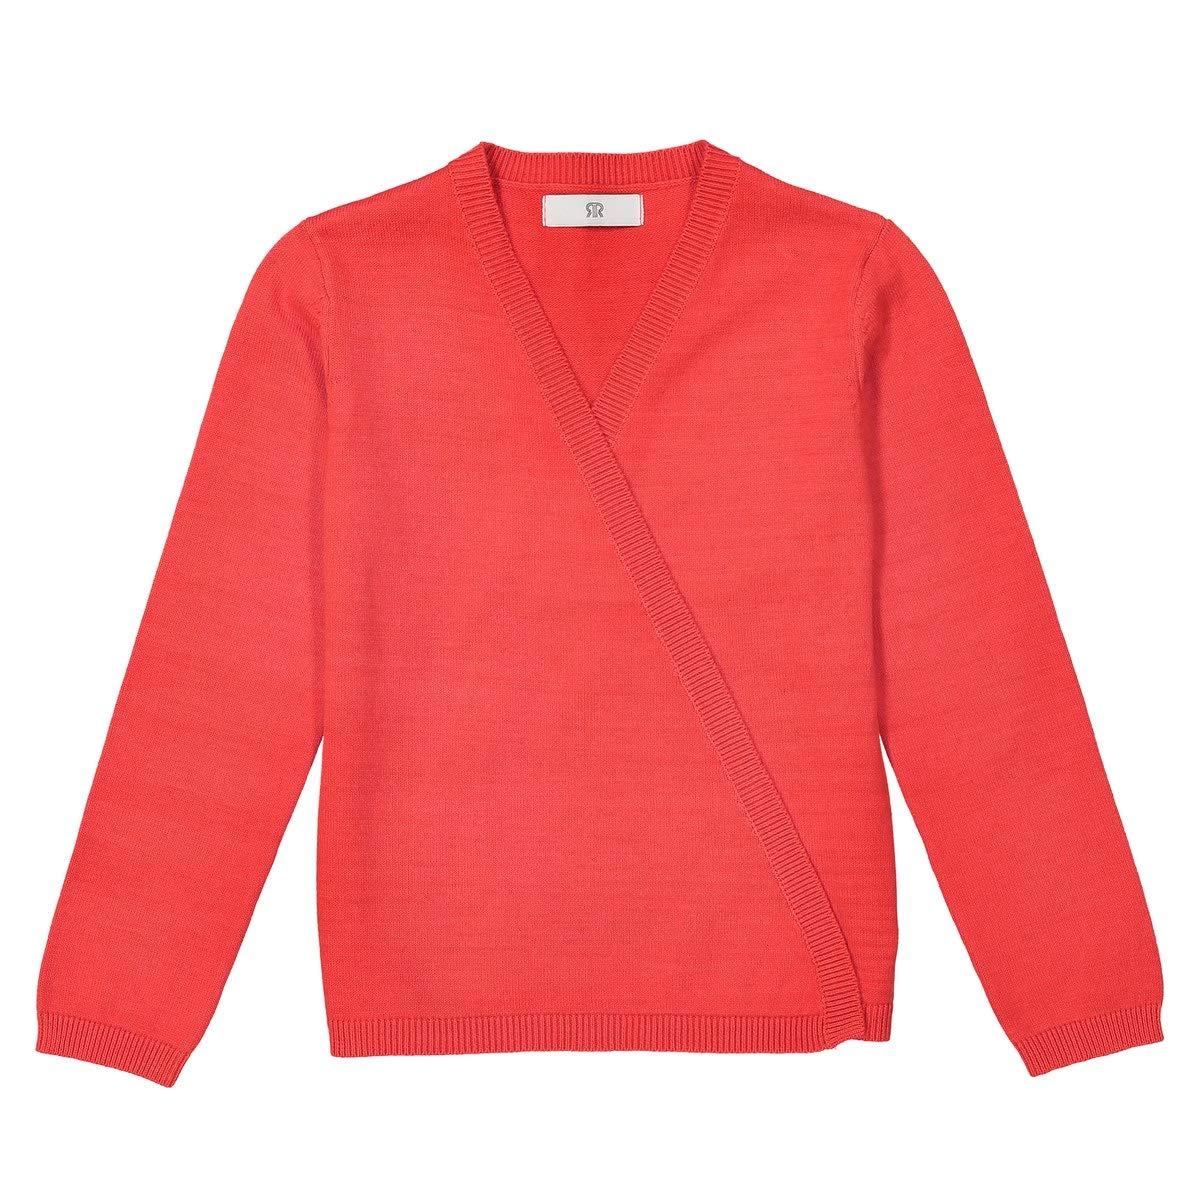 Uniross Plain Cotton Cardigan 2-12 Years